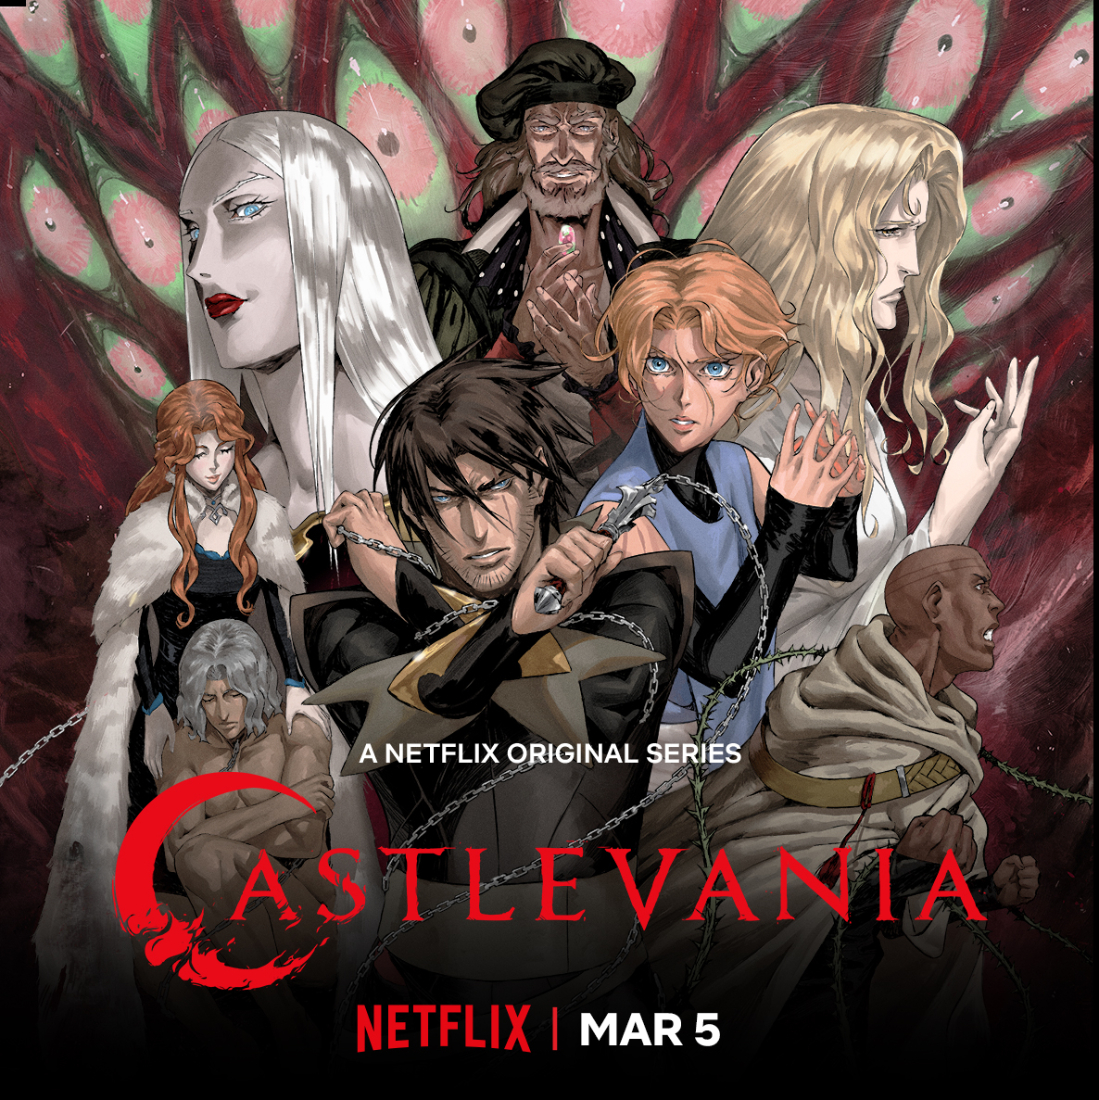 Castlevania Season 3 Gets Wild And Intense First Trailer - GameSpot